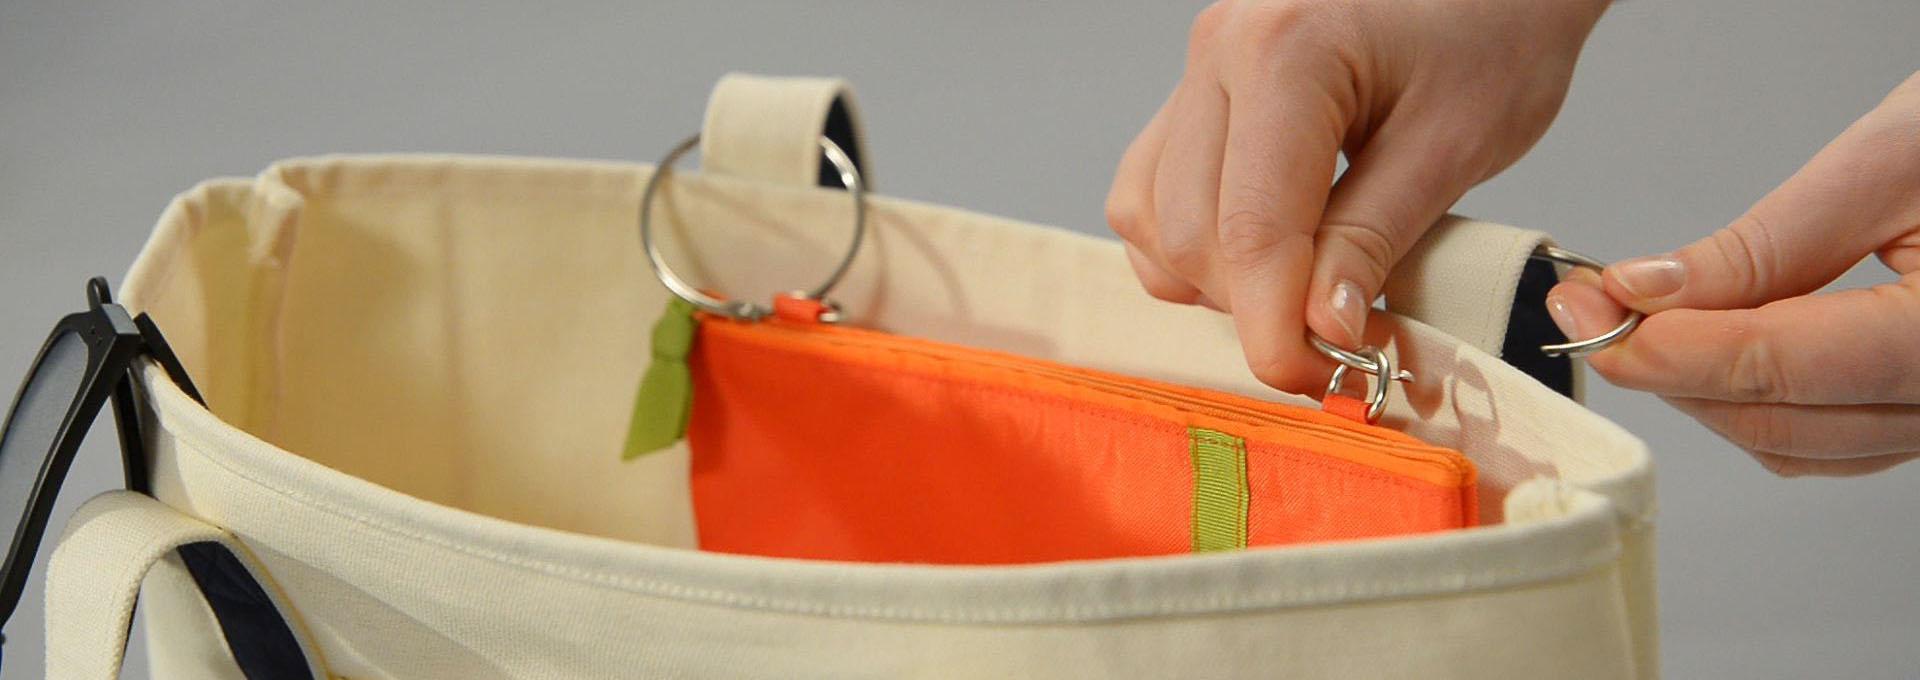 ibou-pocket-slideshow-how-it-works-1